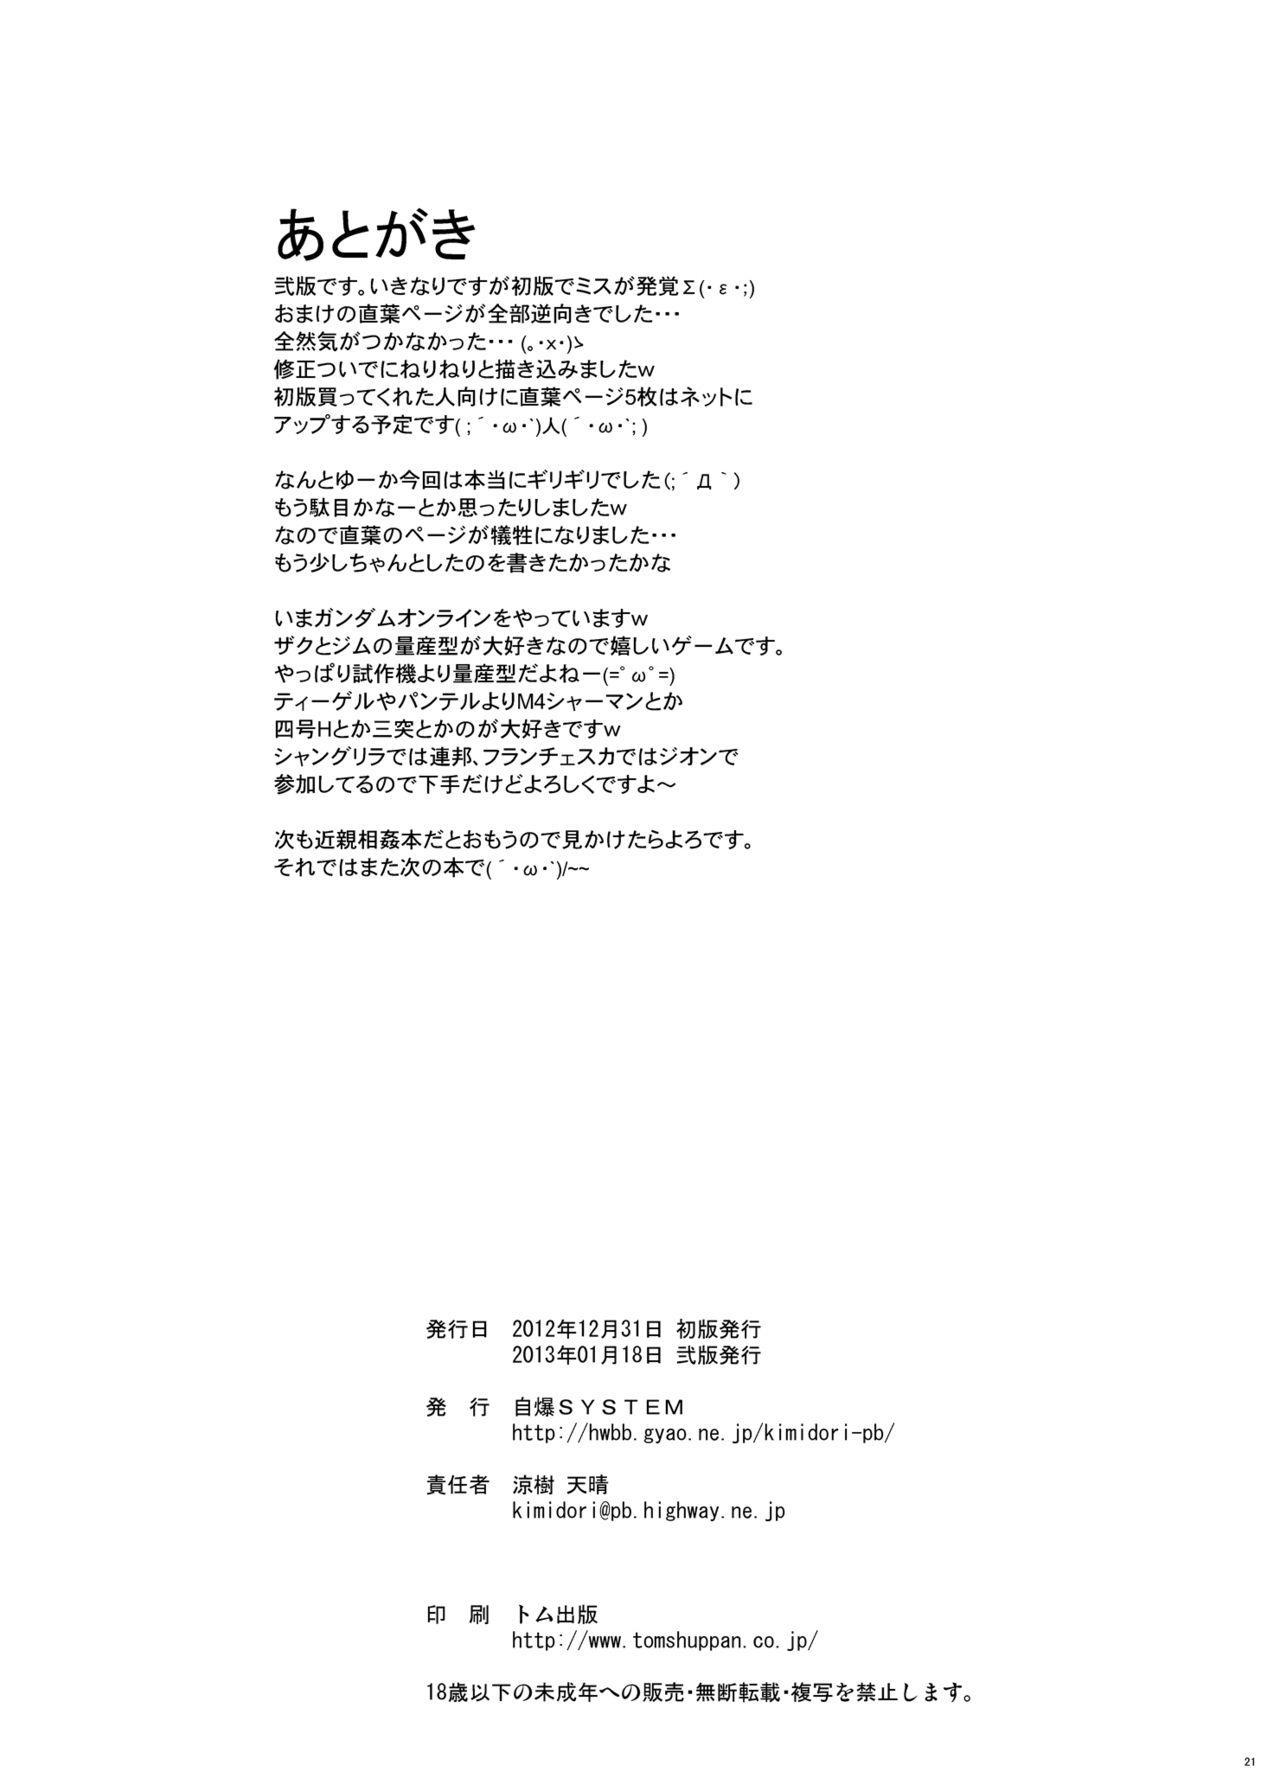 Oyako Suemusume Chichioya Kyoushuu Hen 20